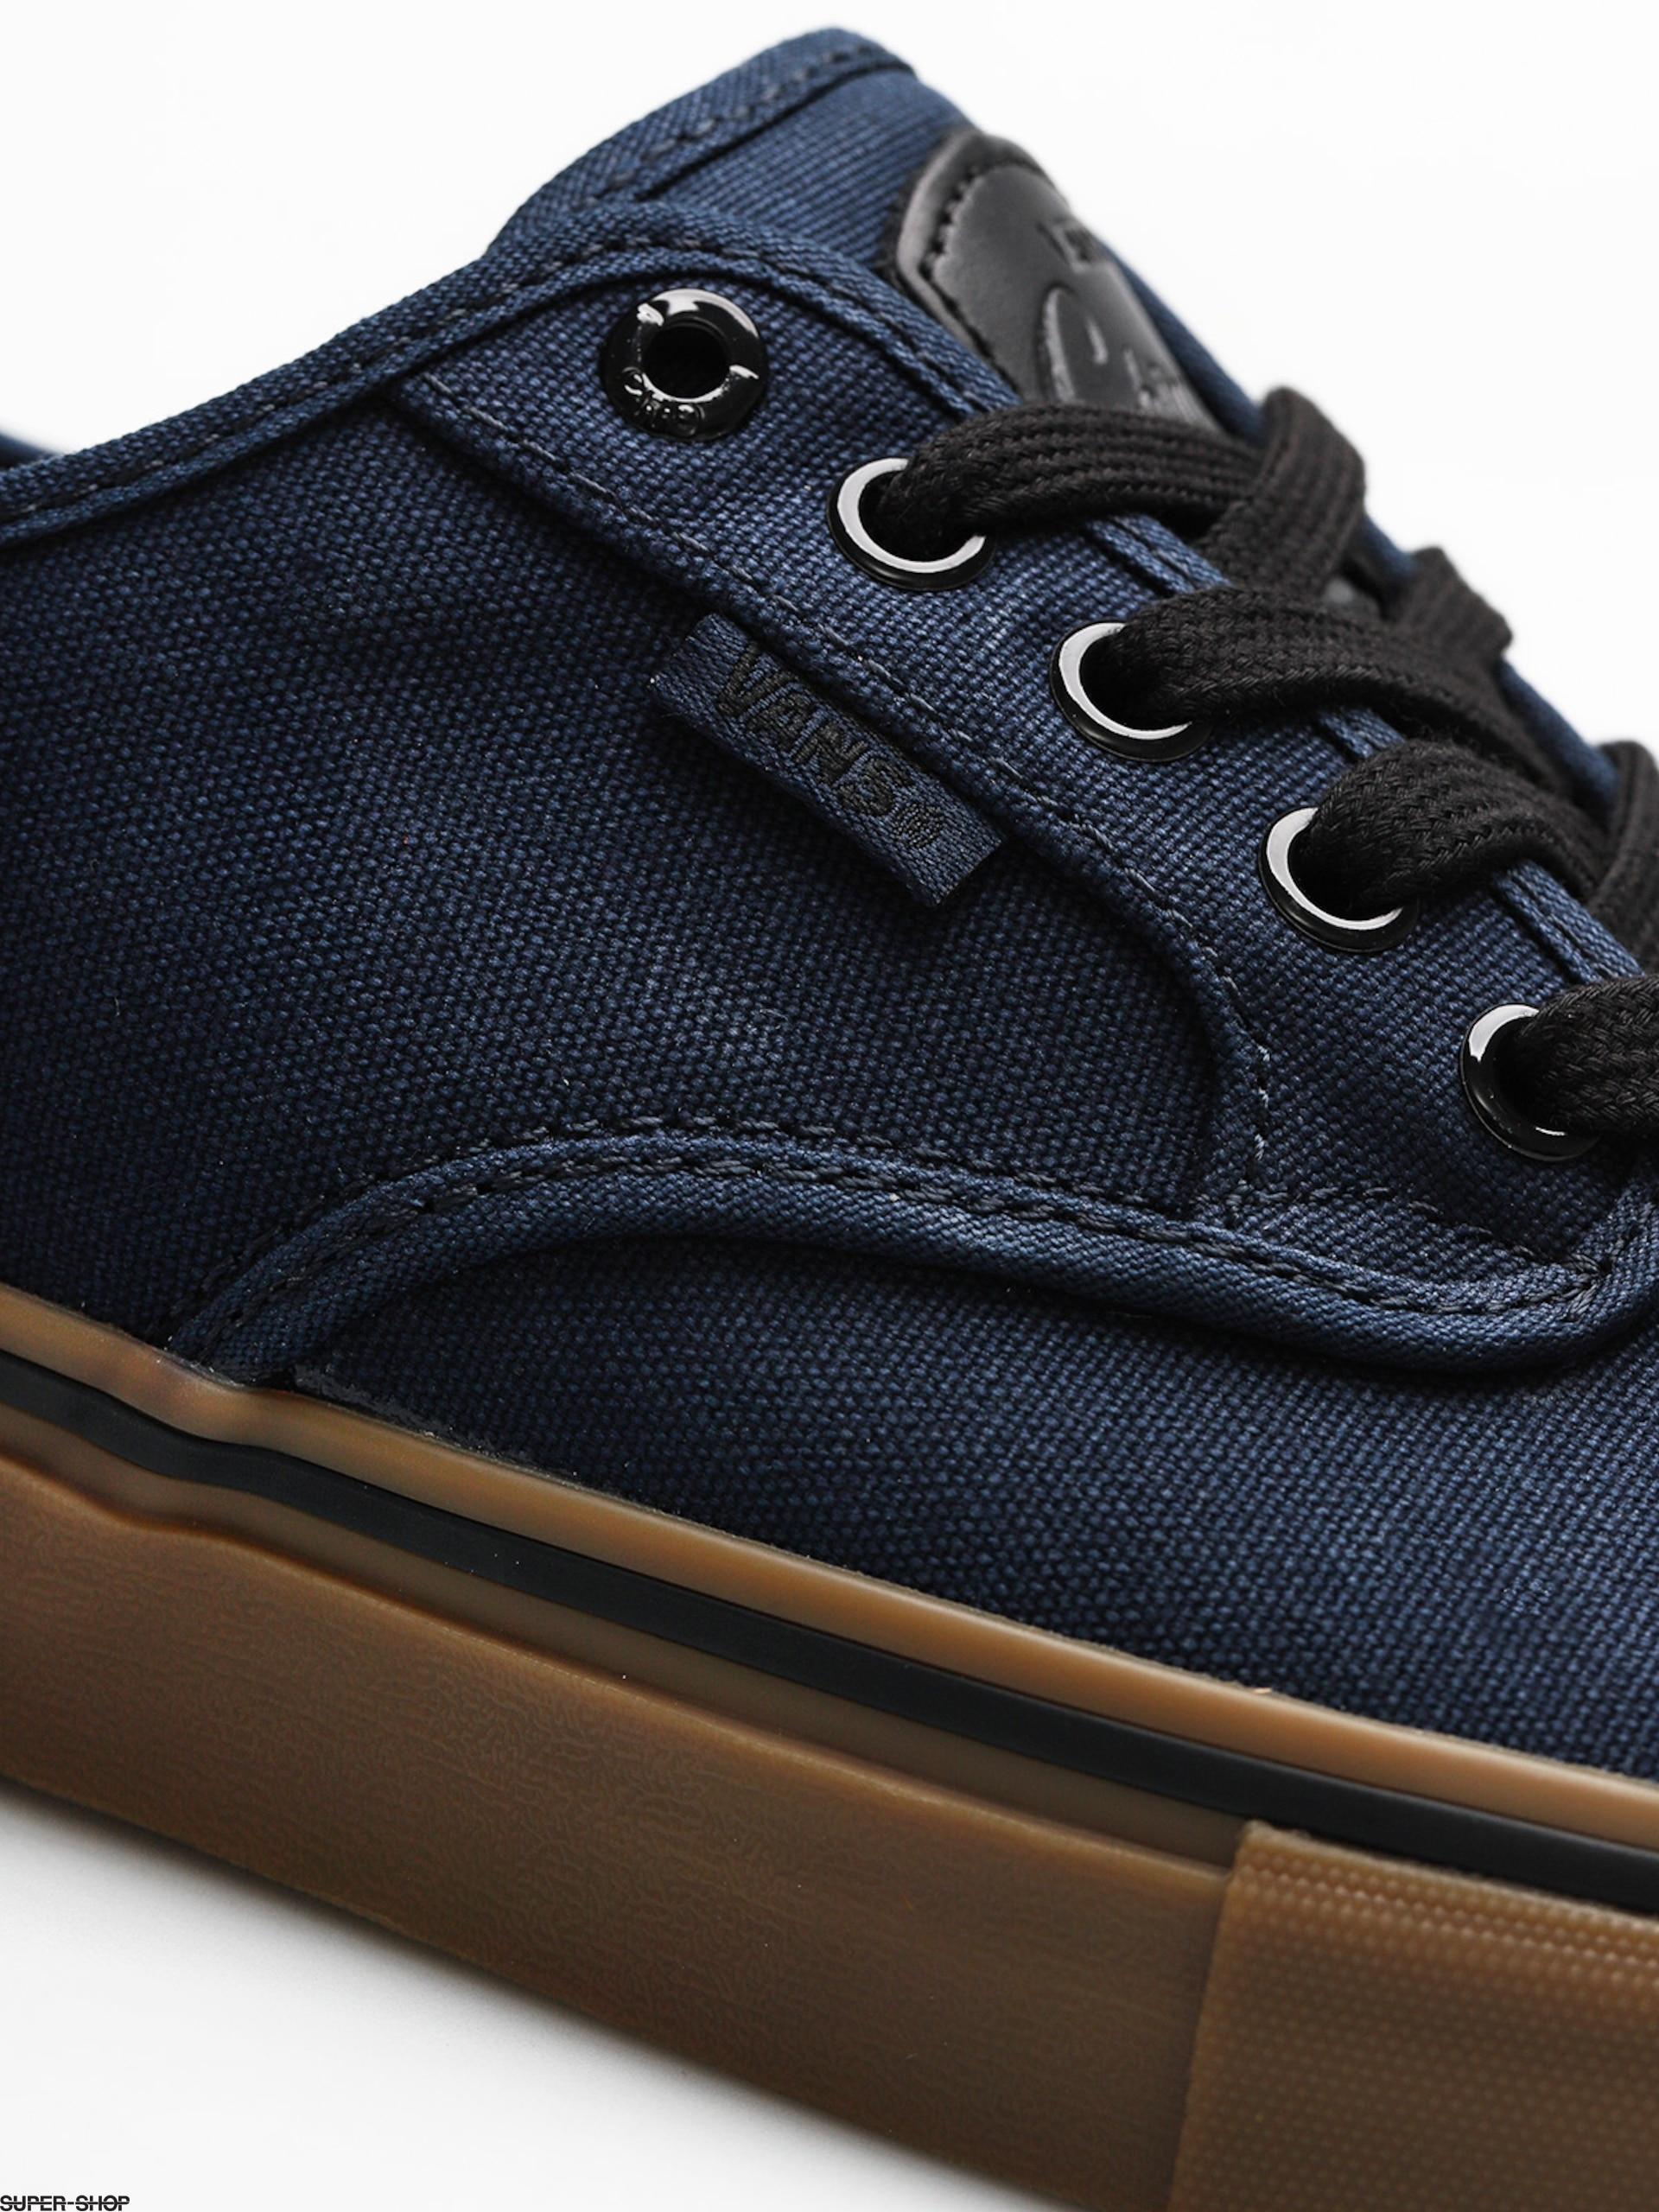 23381a7cde1103 Vans Shoes Chima Ferguson Pro (dress blues medium gum)